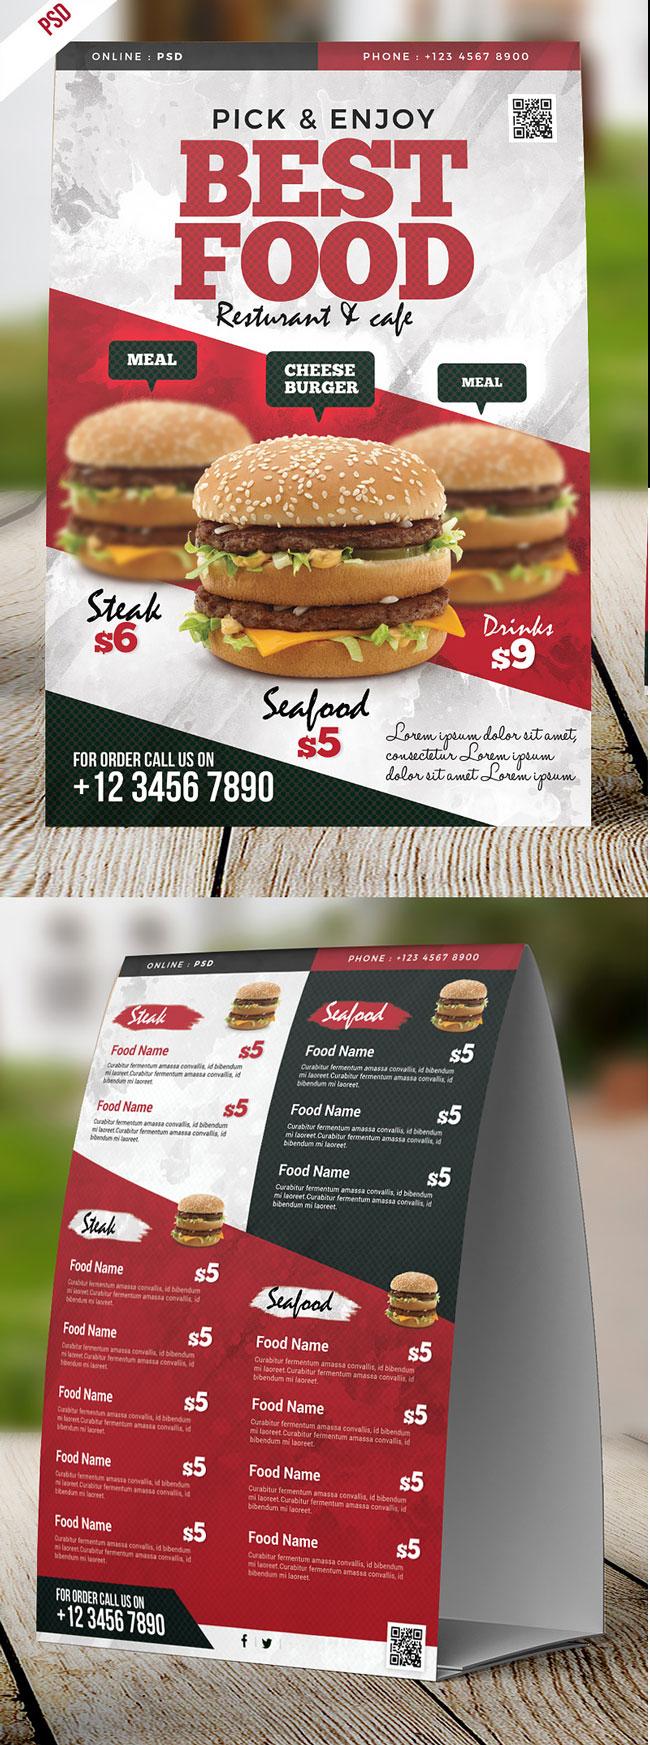 p451 - طرح آماده منوی بی نظیر رستوران فست فود بصورت چاپ دو رو با عکس چیزبرگر خوشمزه